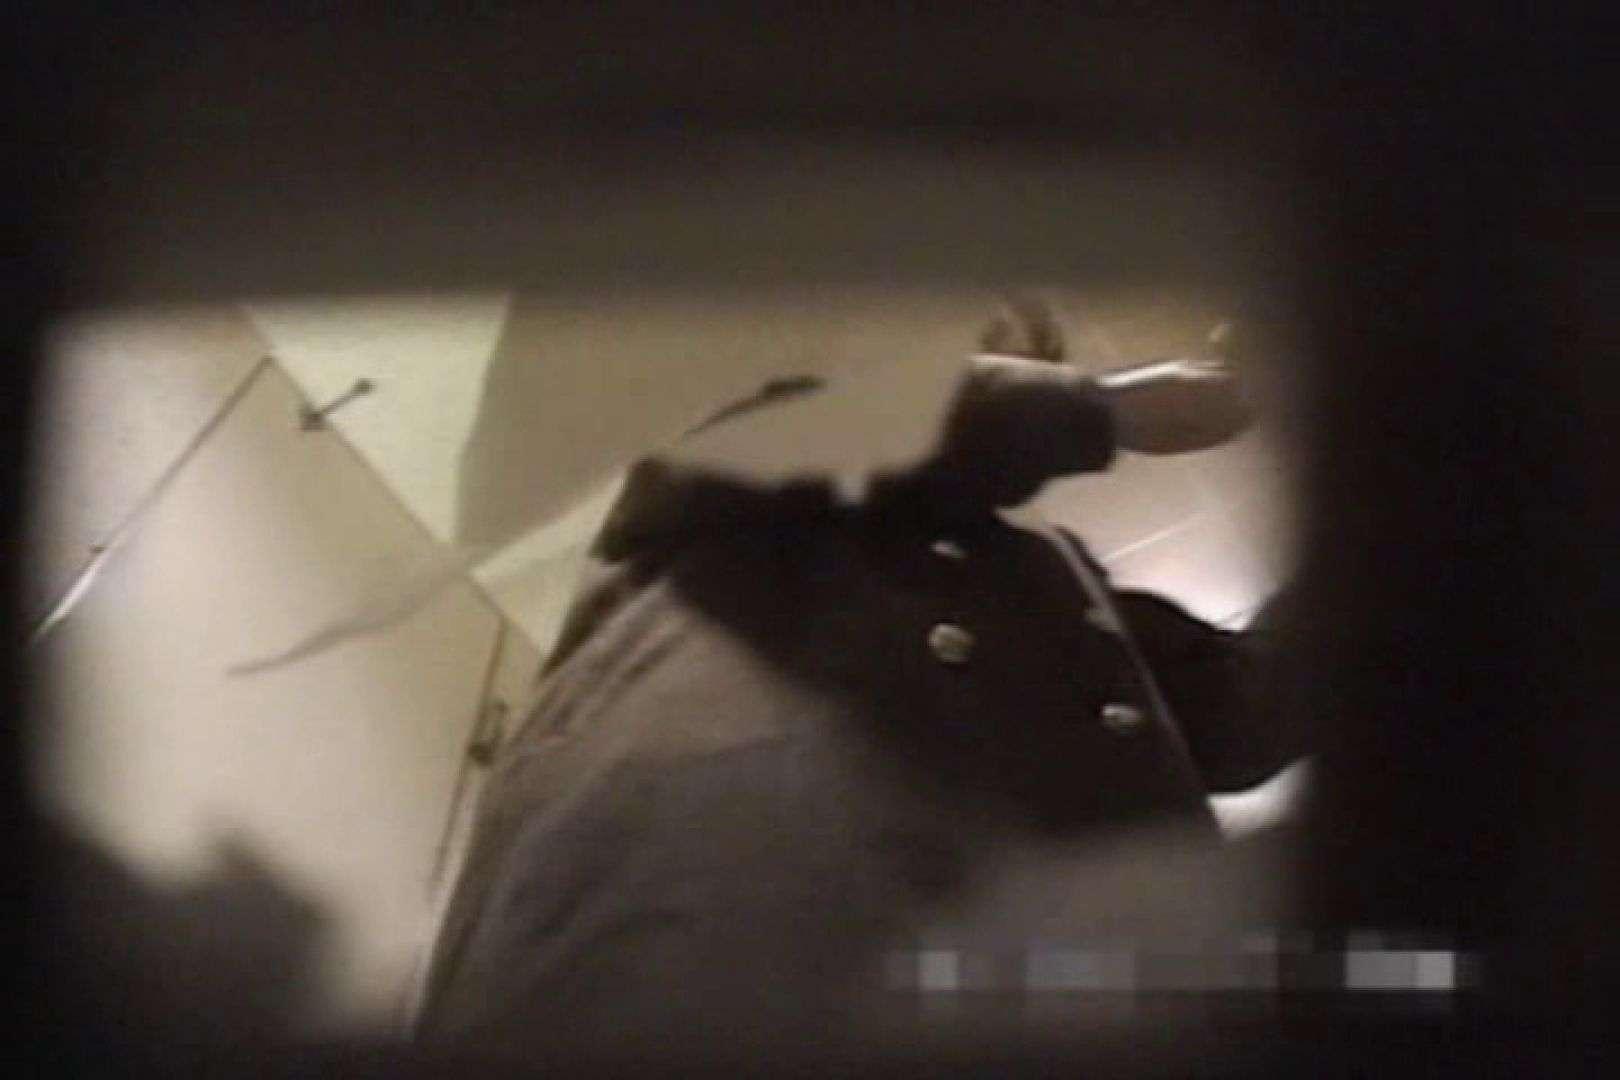 STY-013 実録!2カメde女子洗面所 接写 おまんこ無修正動画無料 113pic 73